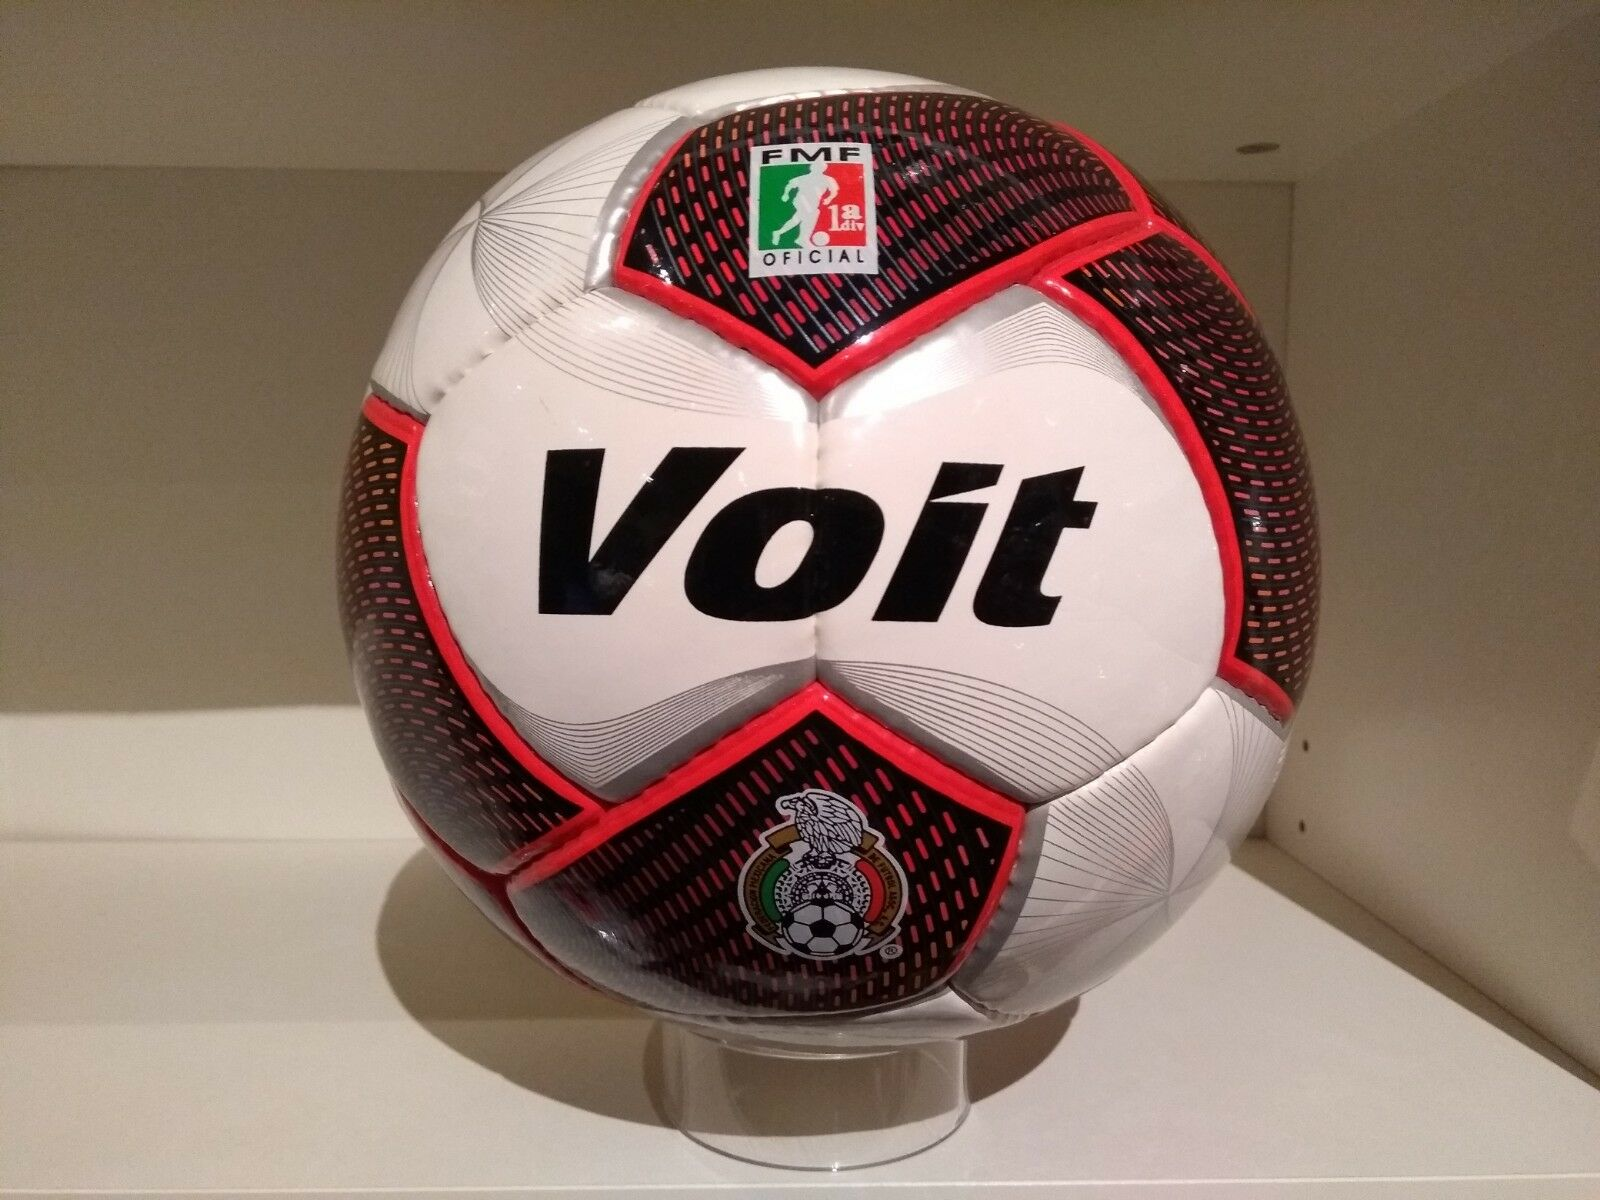 Voit Pyro Official Match Ball of Liga MX Apertura Apertura Apertura 2012 c6434b